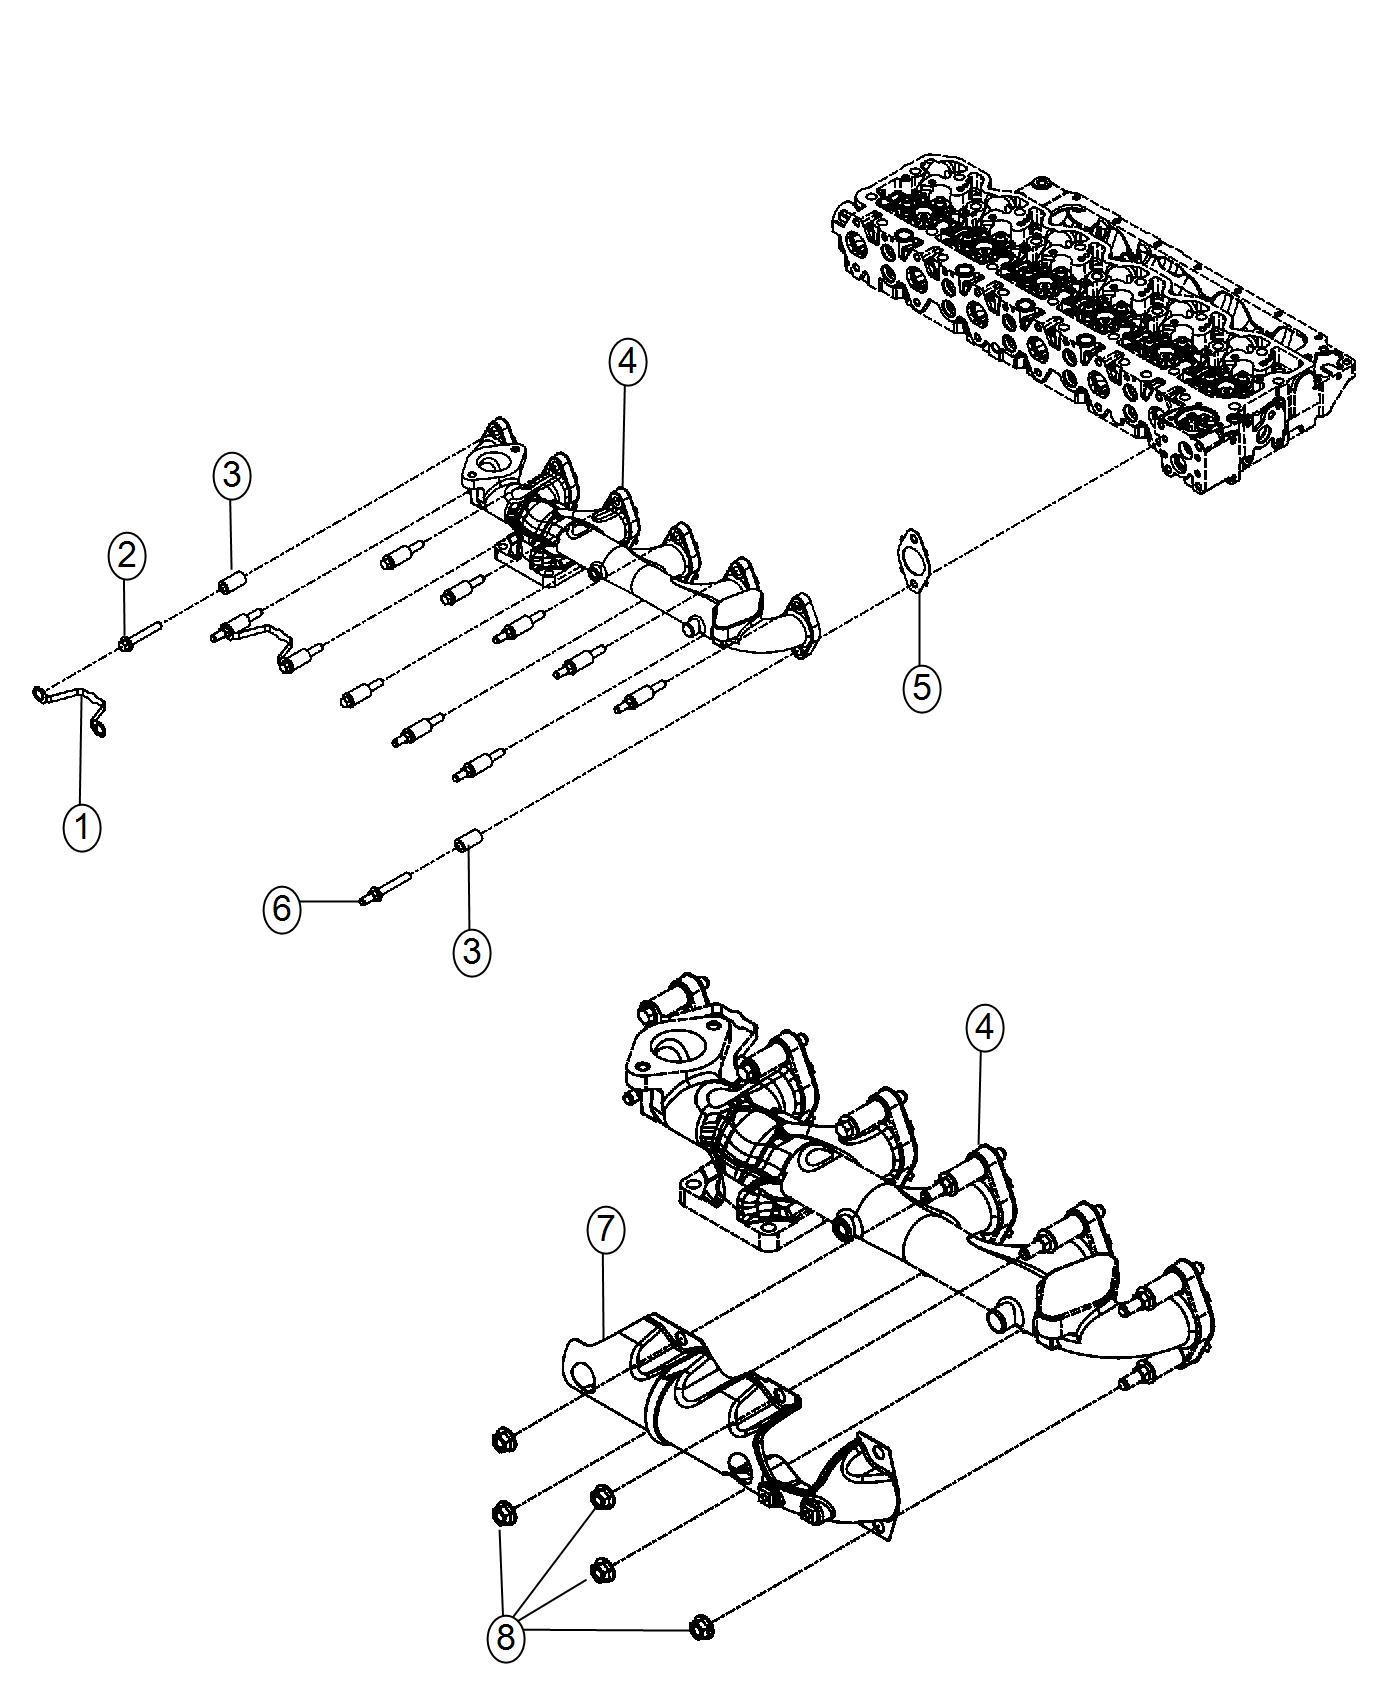 Dodge Ram Manifold Exhaust Emissions State